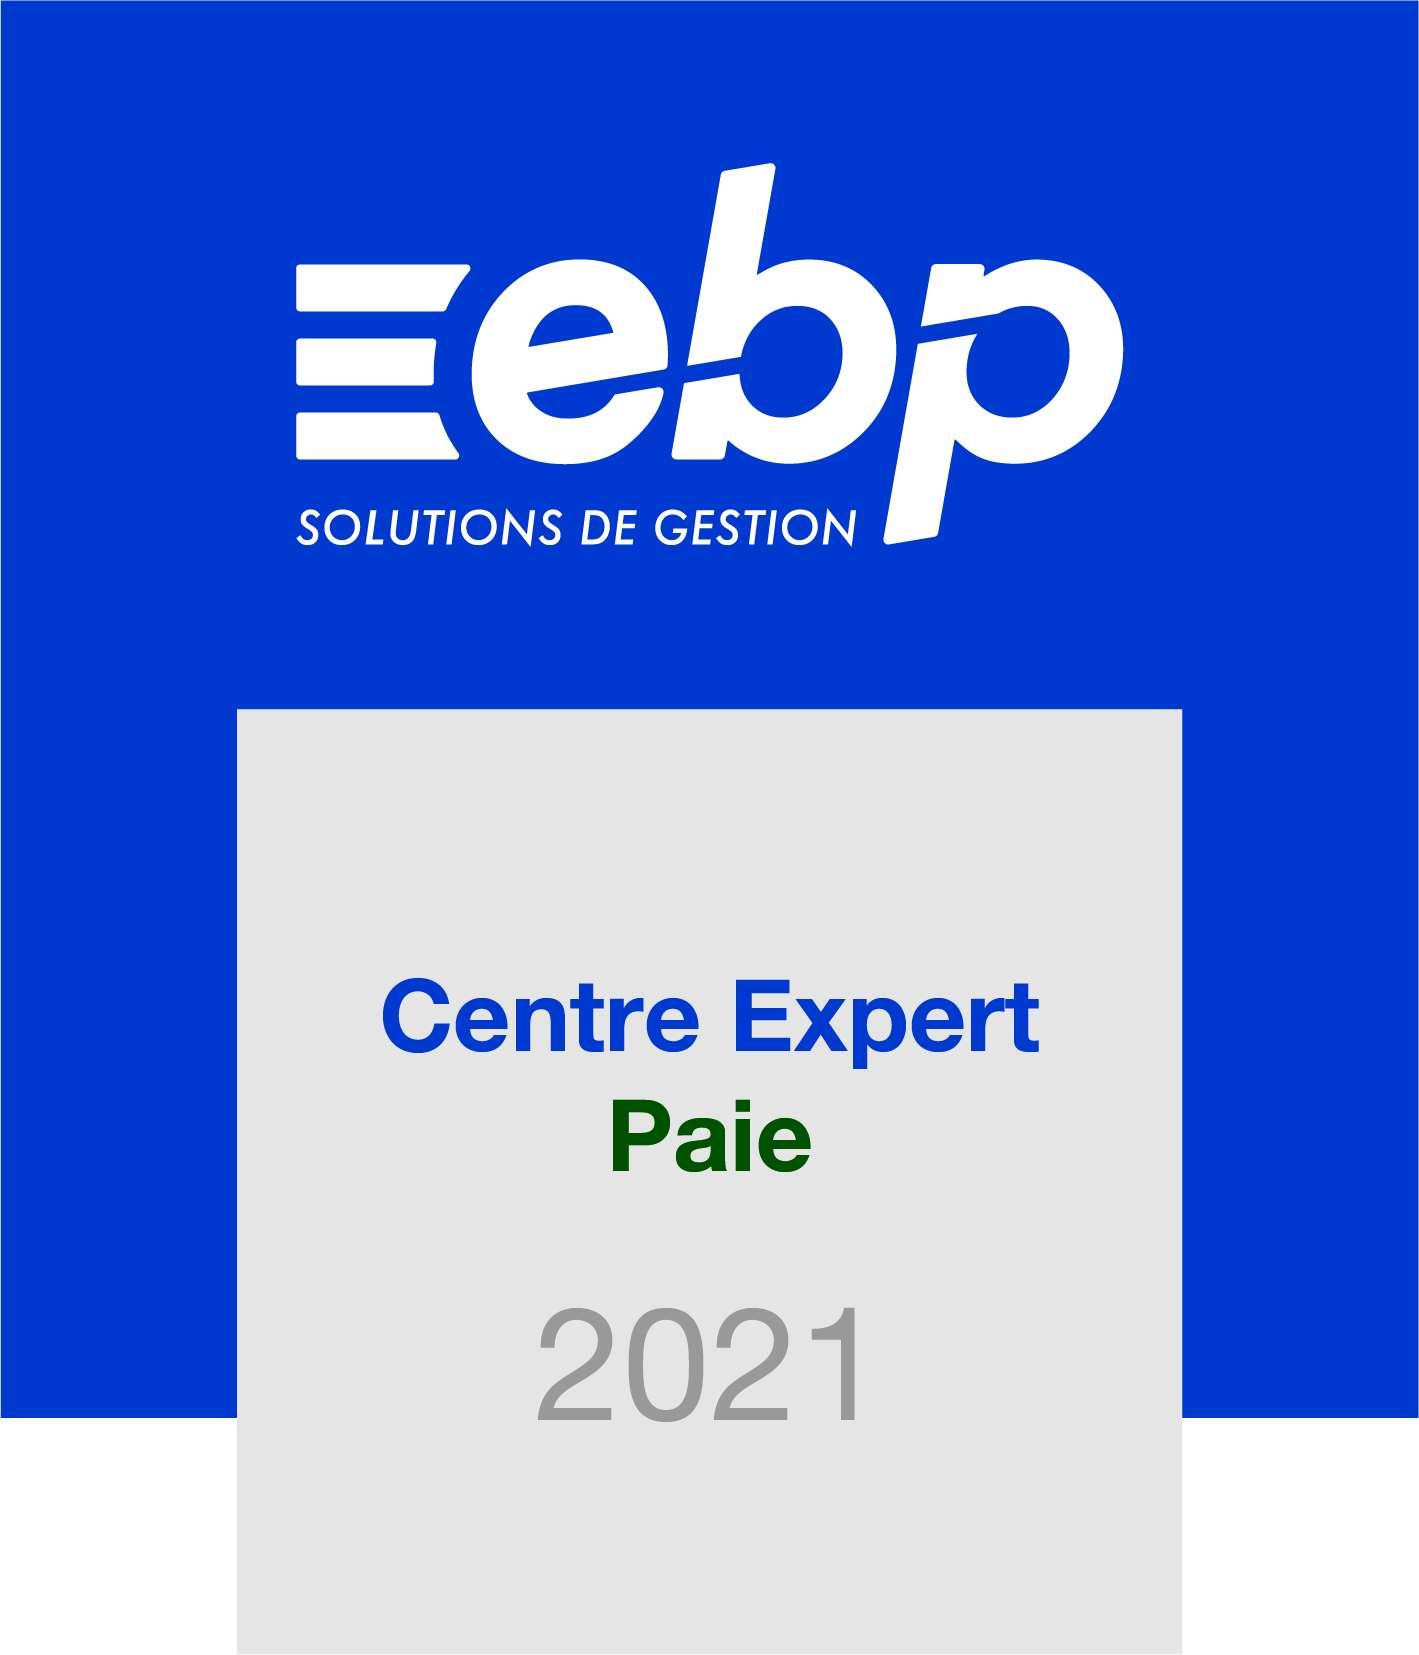 Centre expert Paie